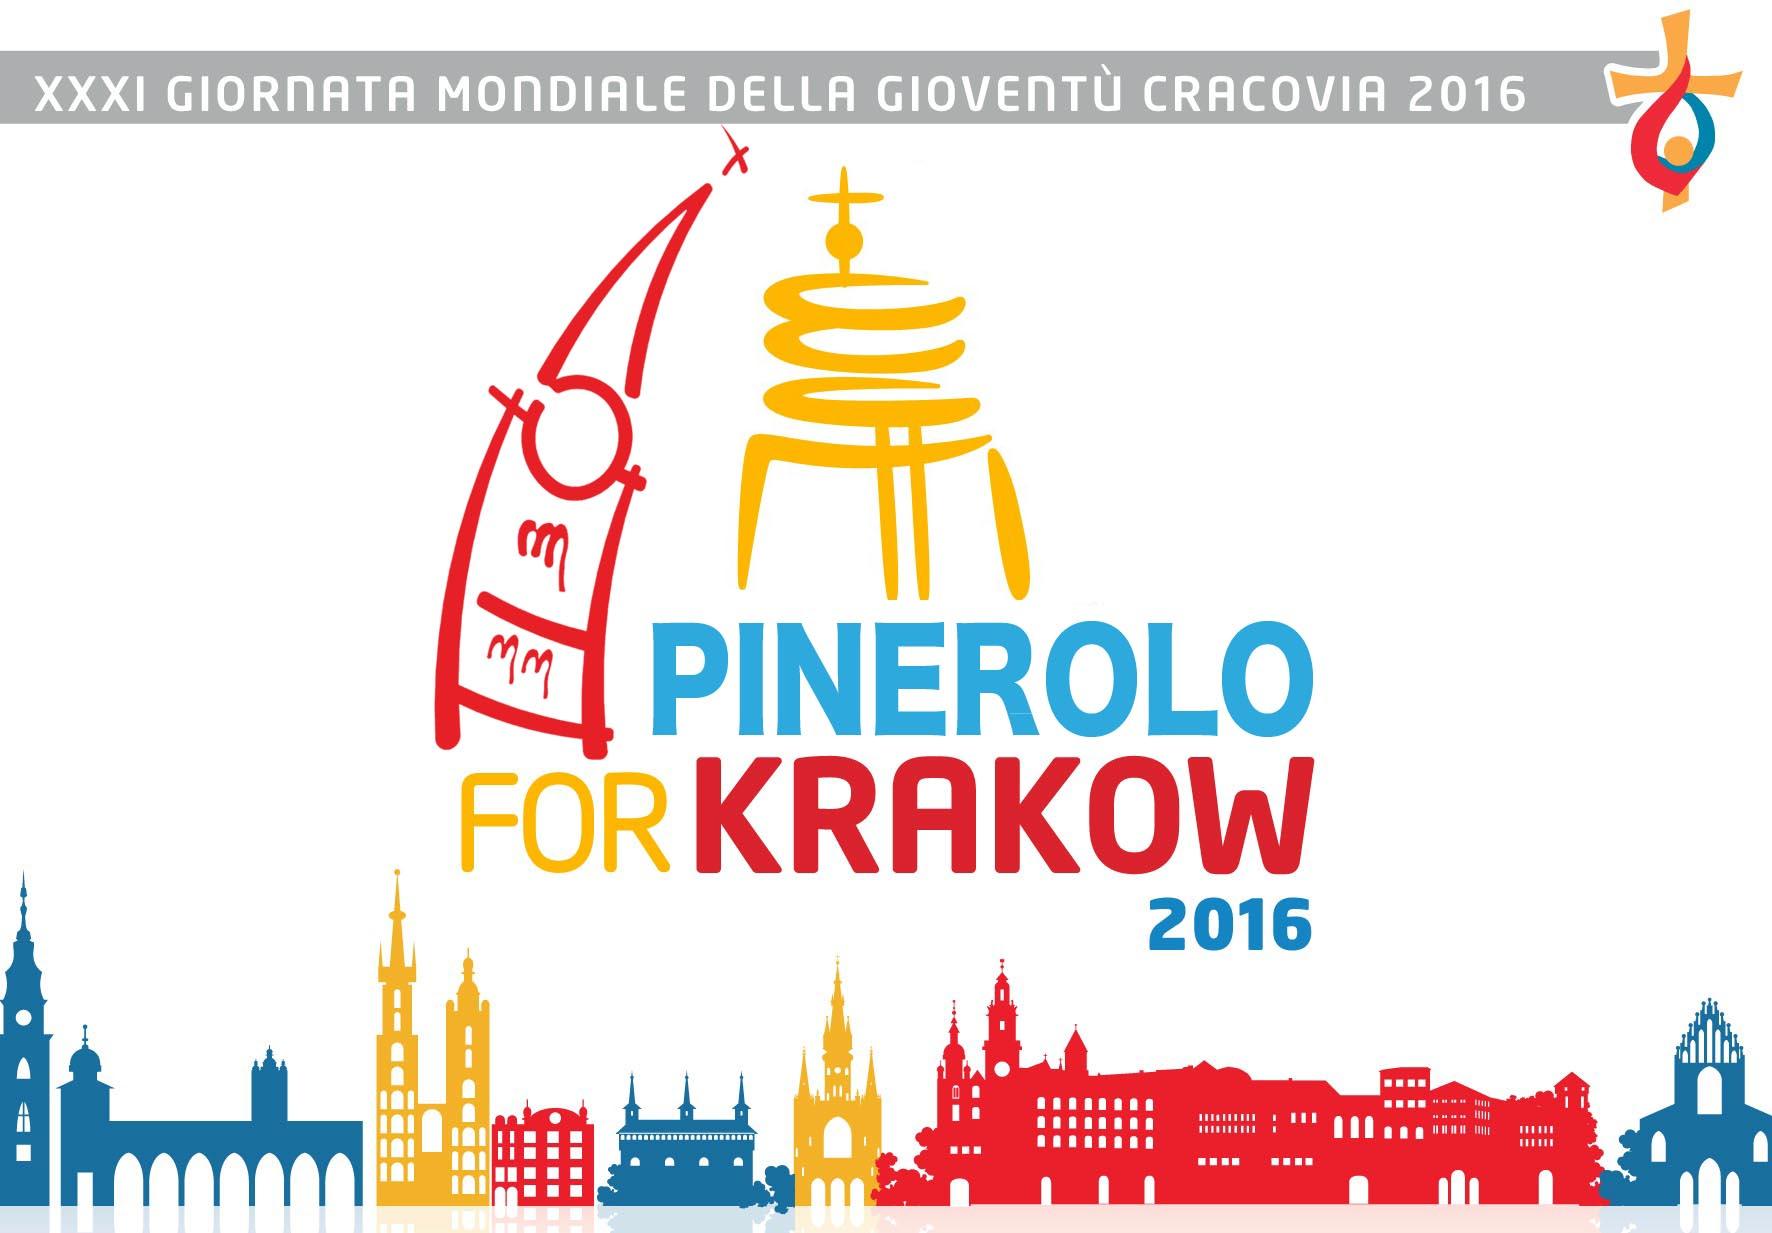 Pinerolo for Krakow 2016